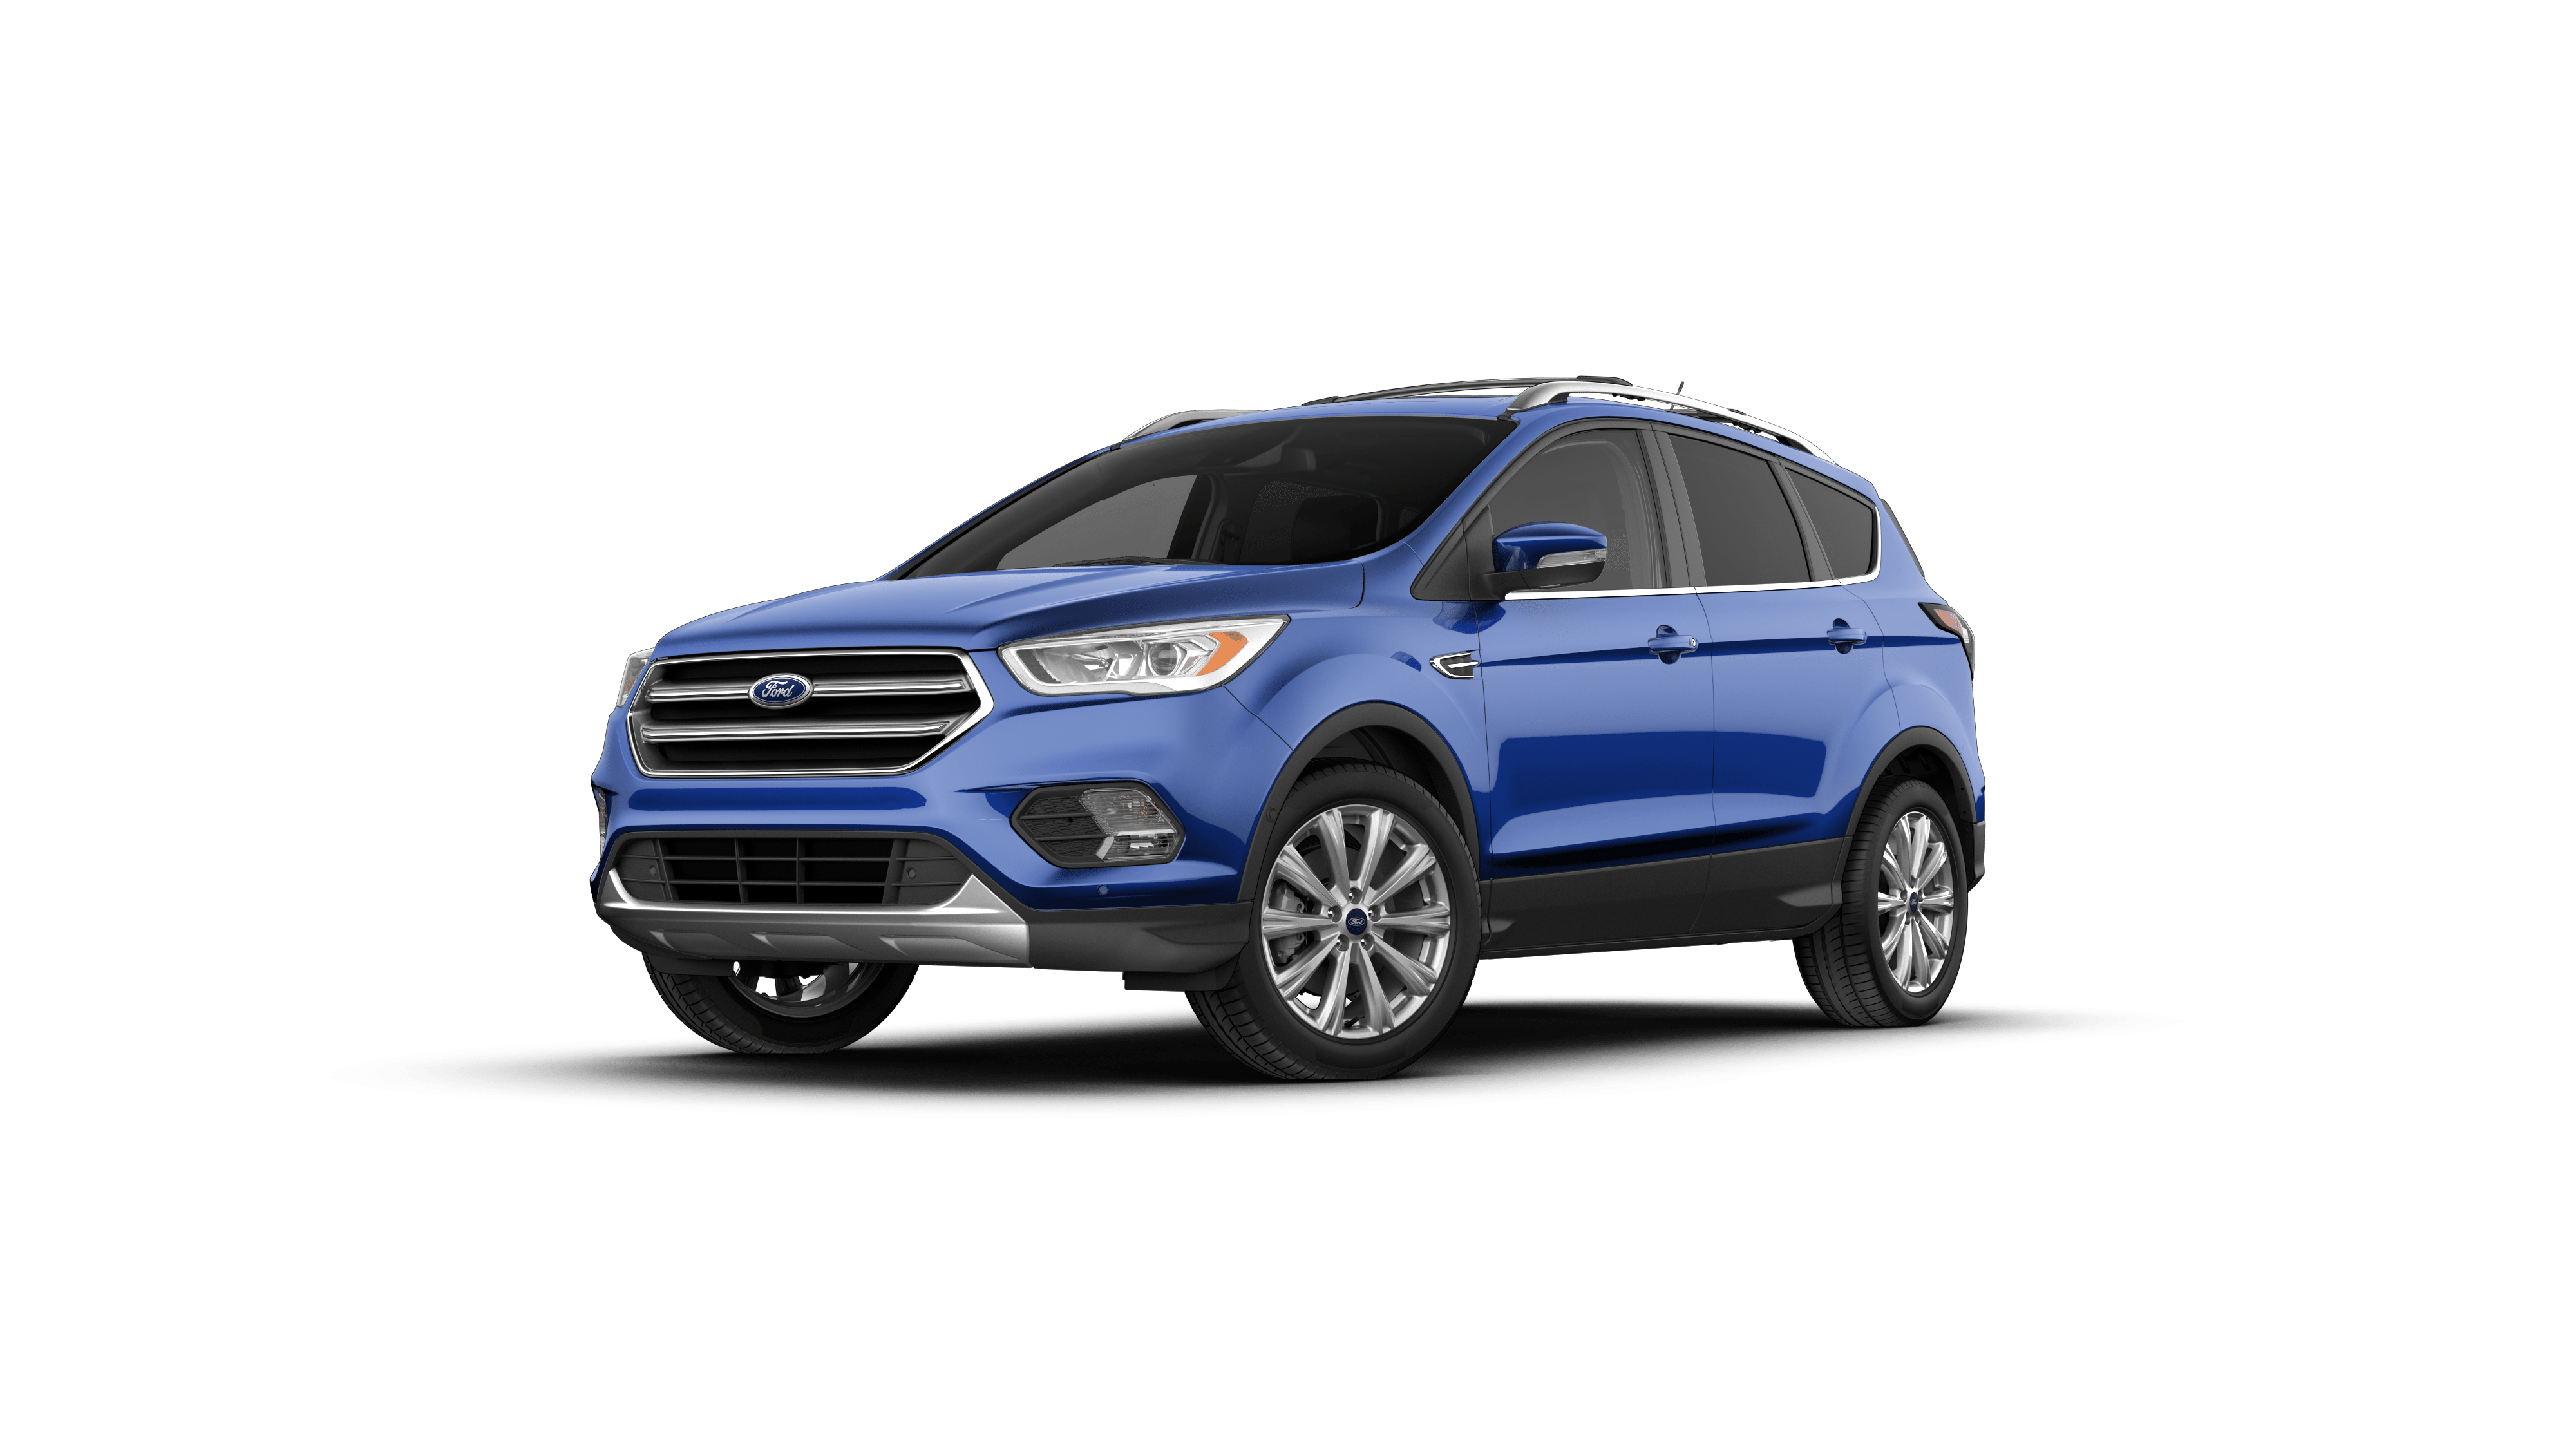 2018 Ford Escape Vehicle Photo in Sierra Vista, AZ 85635-3643